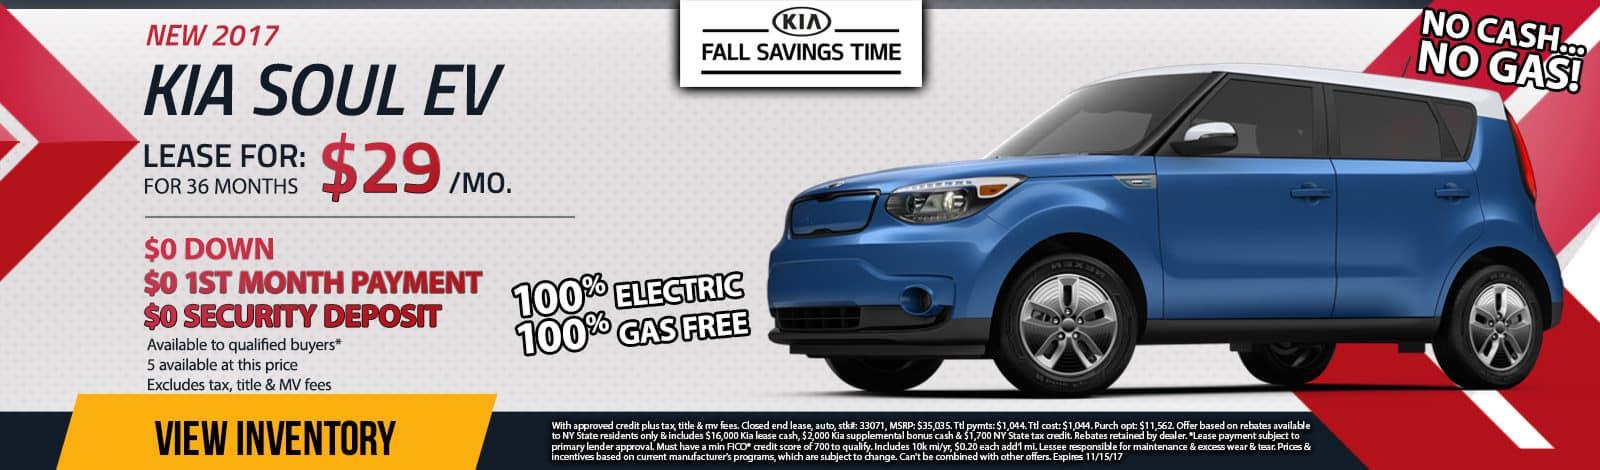 Cherry Hill Kia Dealer >> Cherry Hill Kia Parts All About Kia